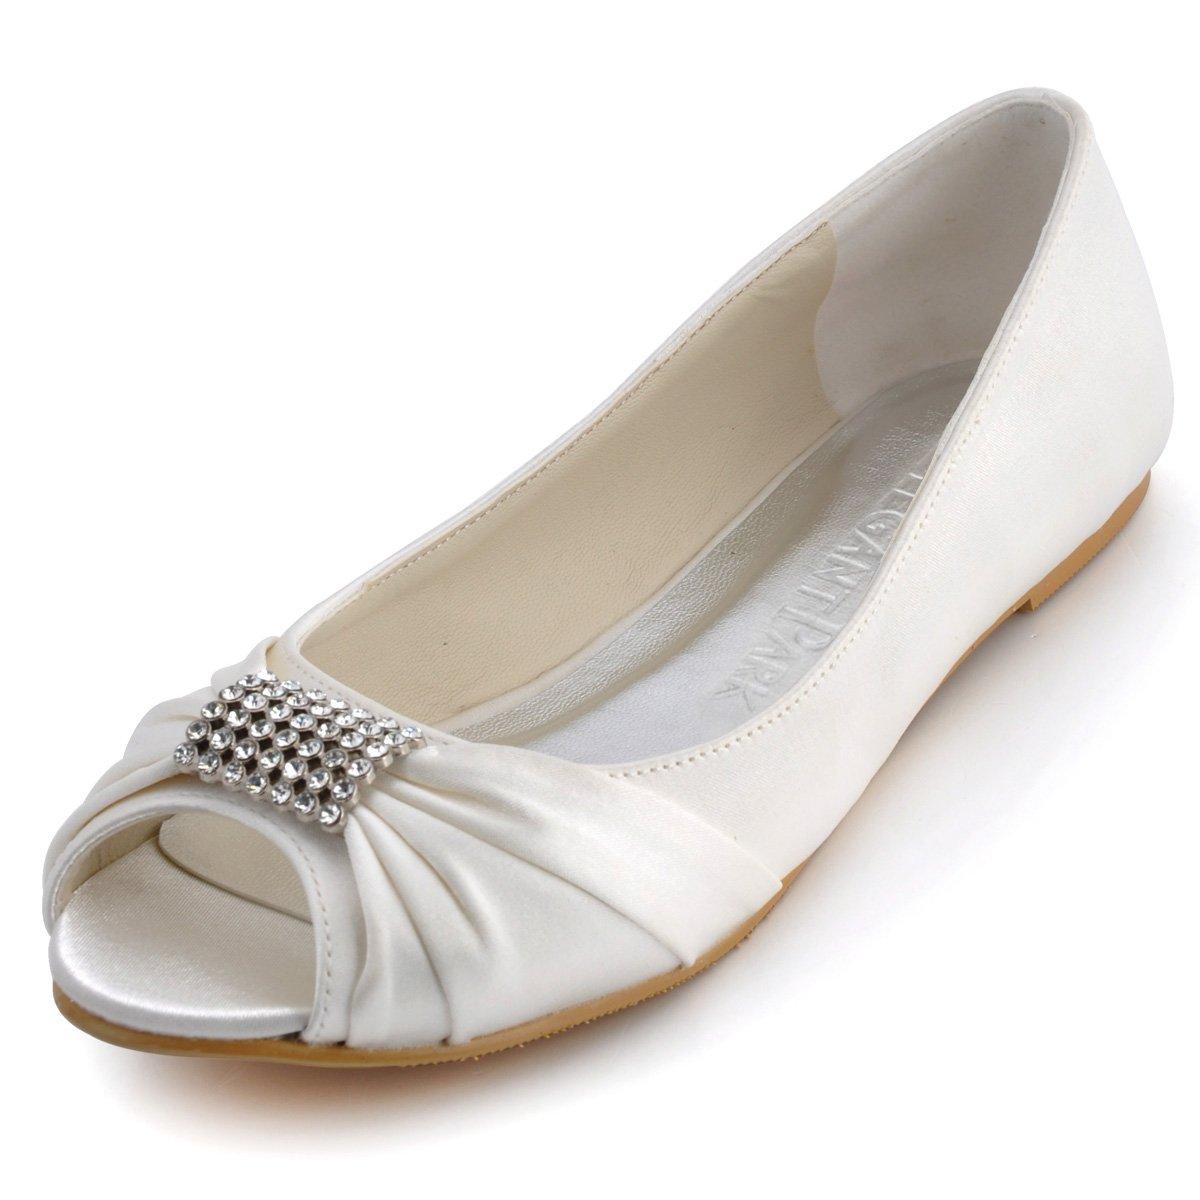 ElegantPark EP2053 Women Peep Toe Rhinestones Comfort Flats Pleated Satin Wedding Bridal Shoes Ivory US 11